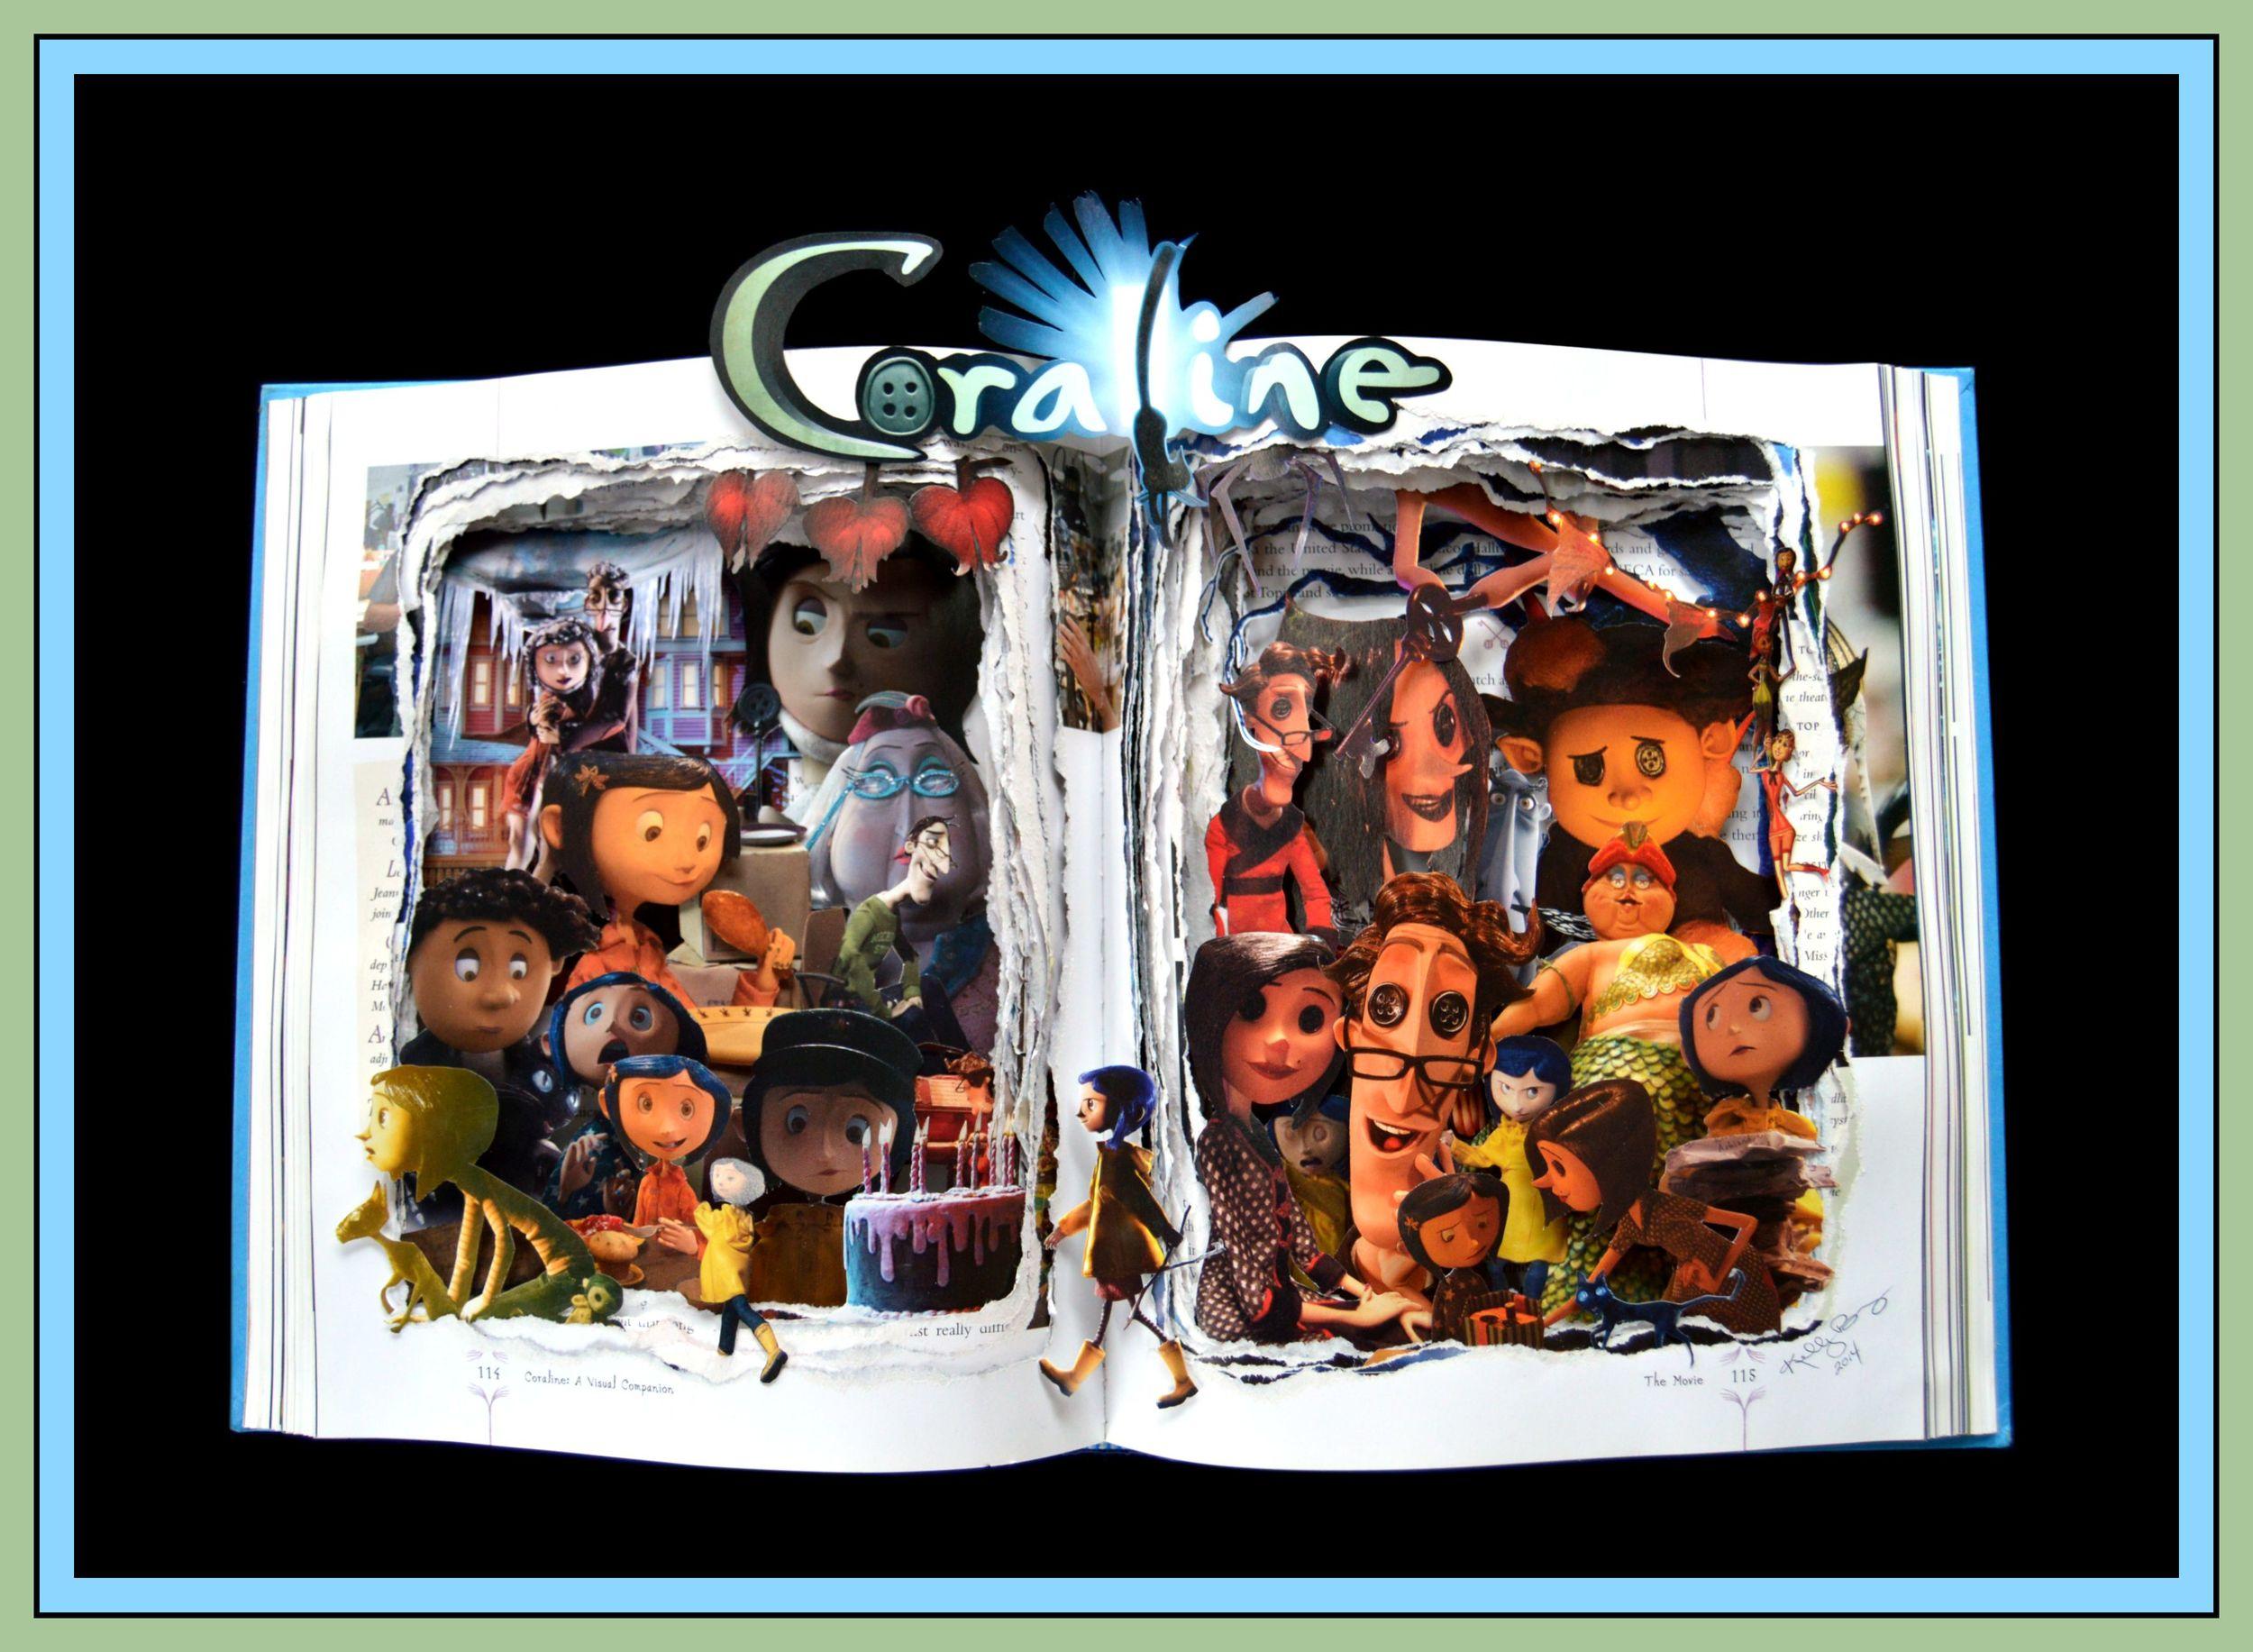 Coraline - 16x20x3 - Book Sculpture